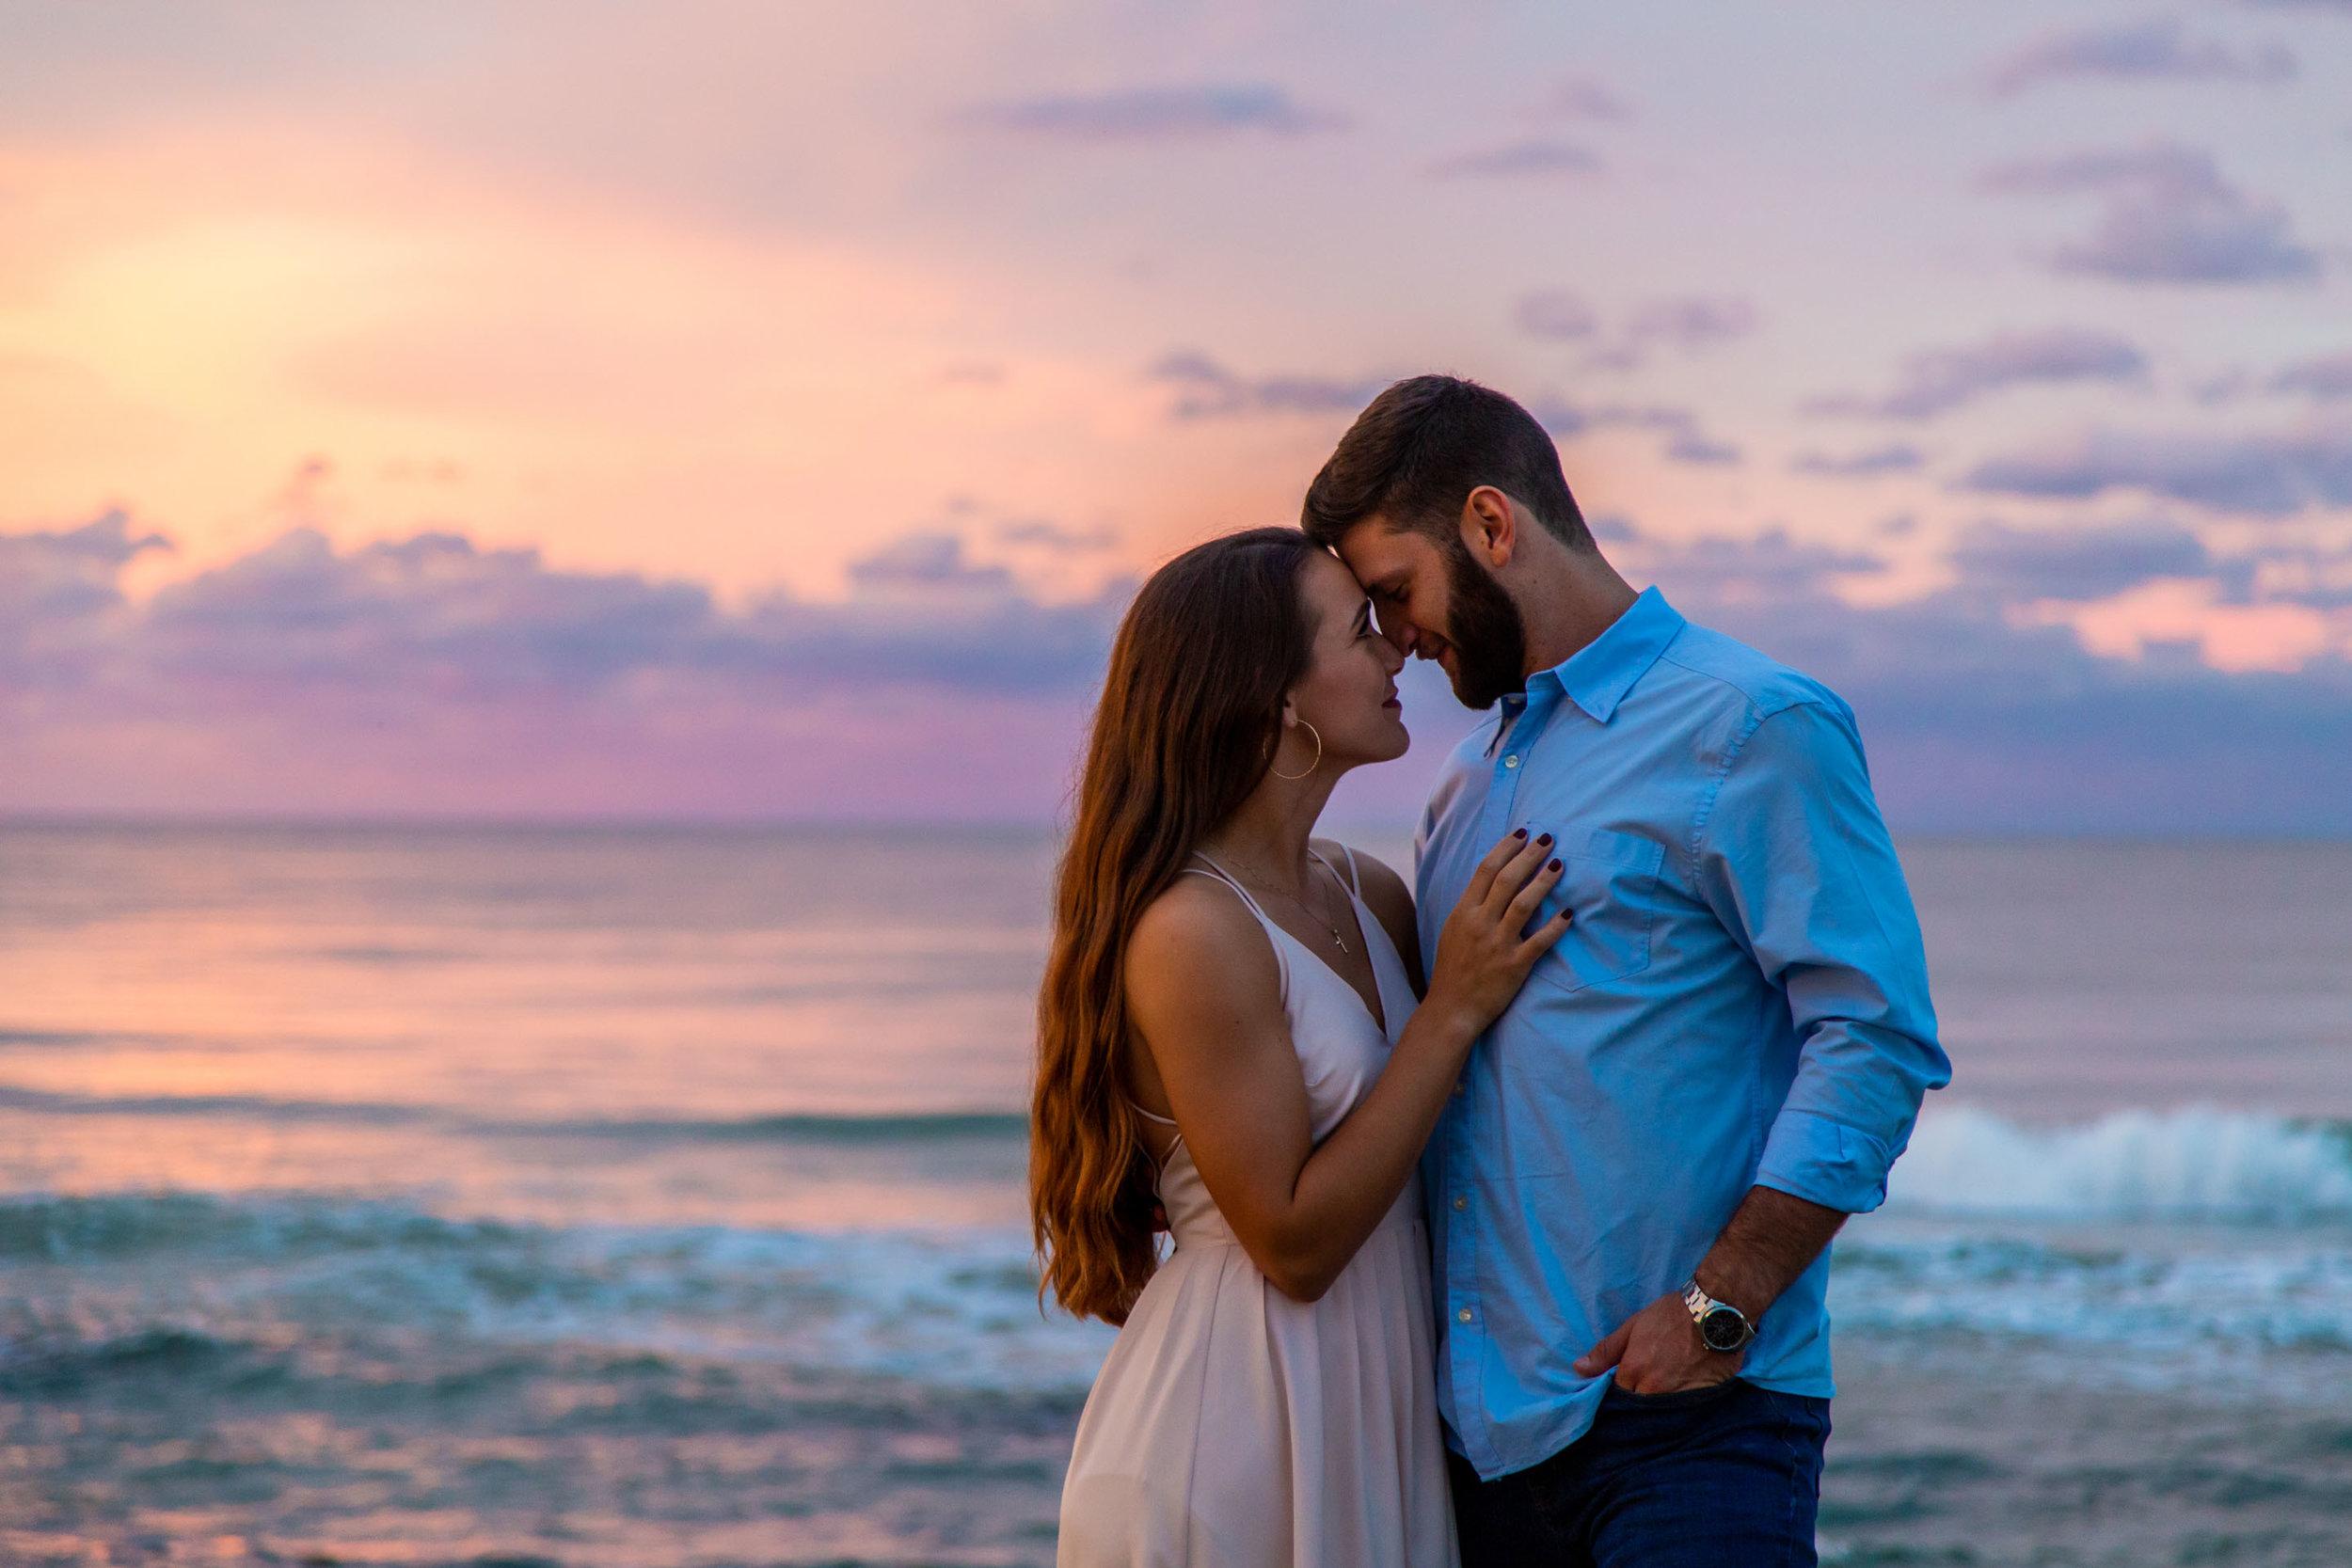 adam-szarmack-jacksonville-wedding-photographer-palm-coast-washing-oaks-garden-state-park-engagement-60.jpg